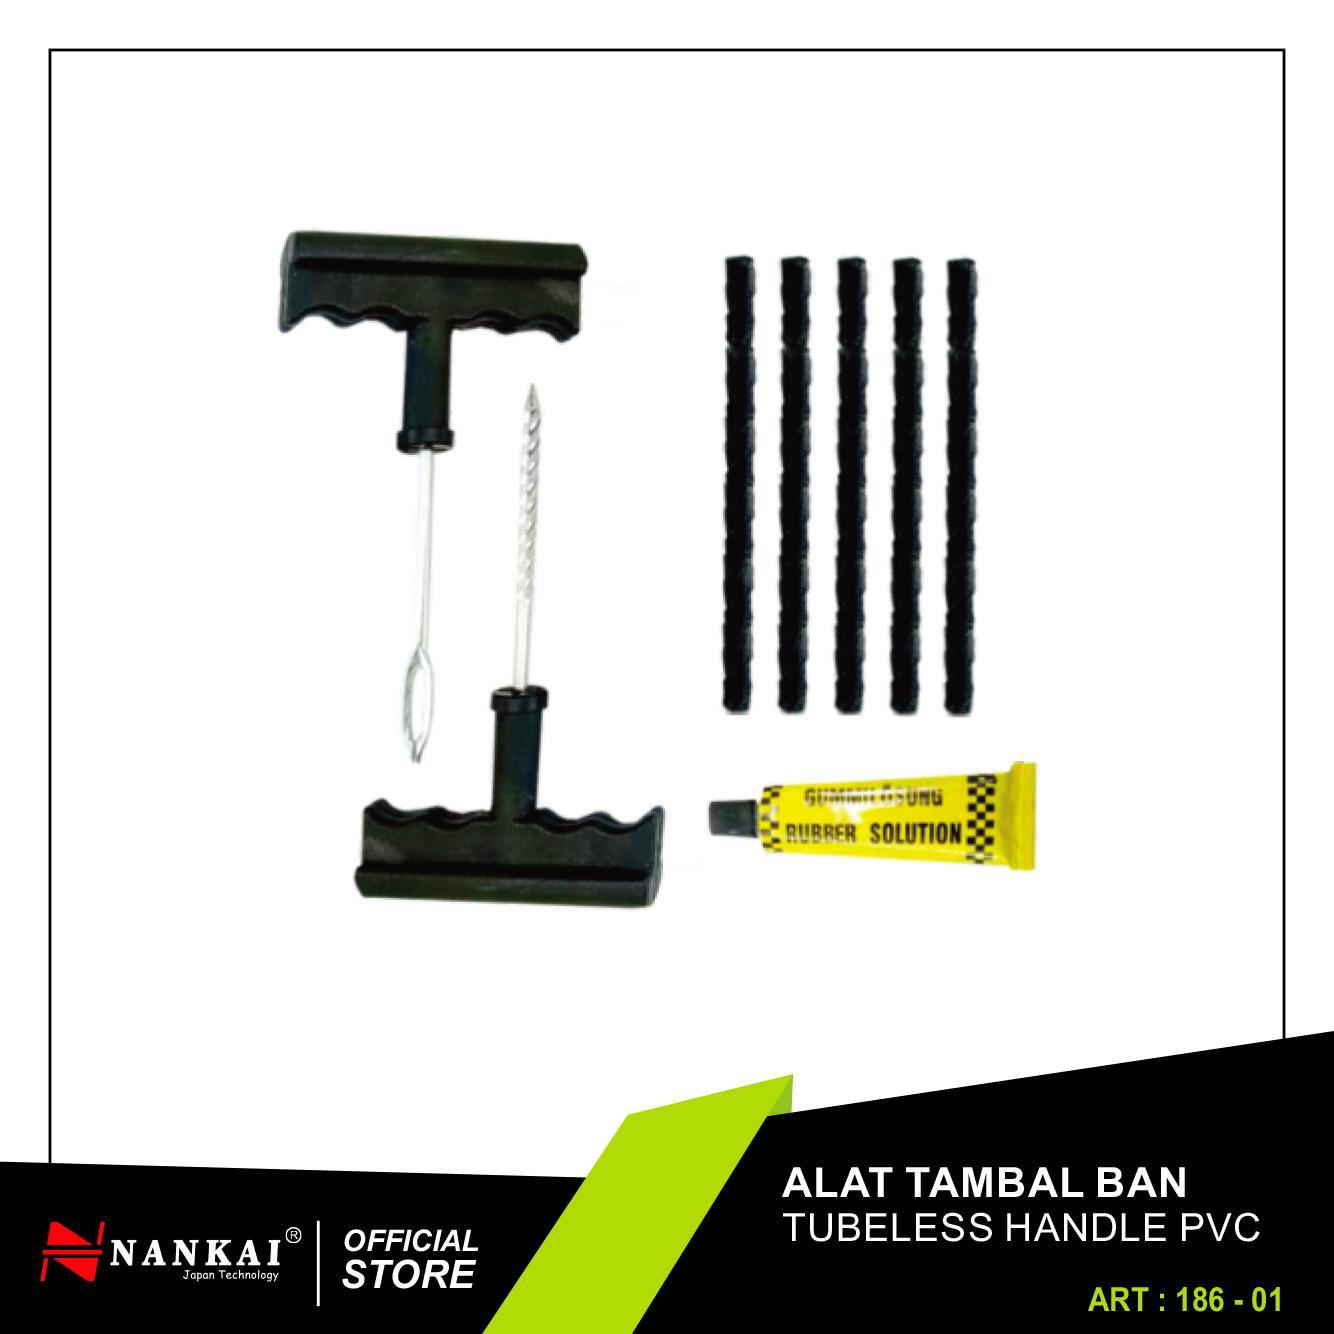 Nankai Alat Tambal Ban Tubeless Handle Pvc By Nankaitools